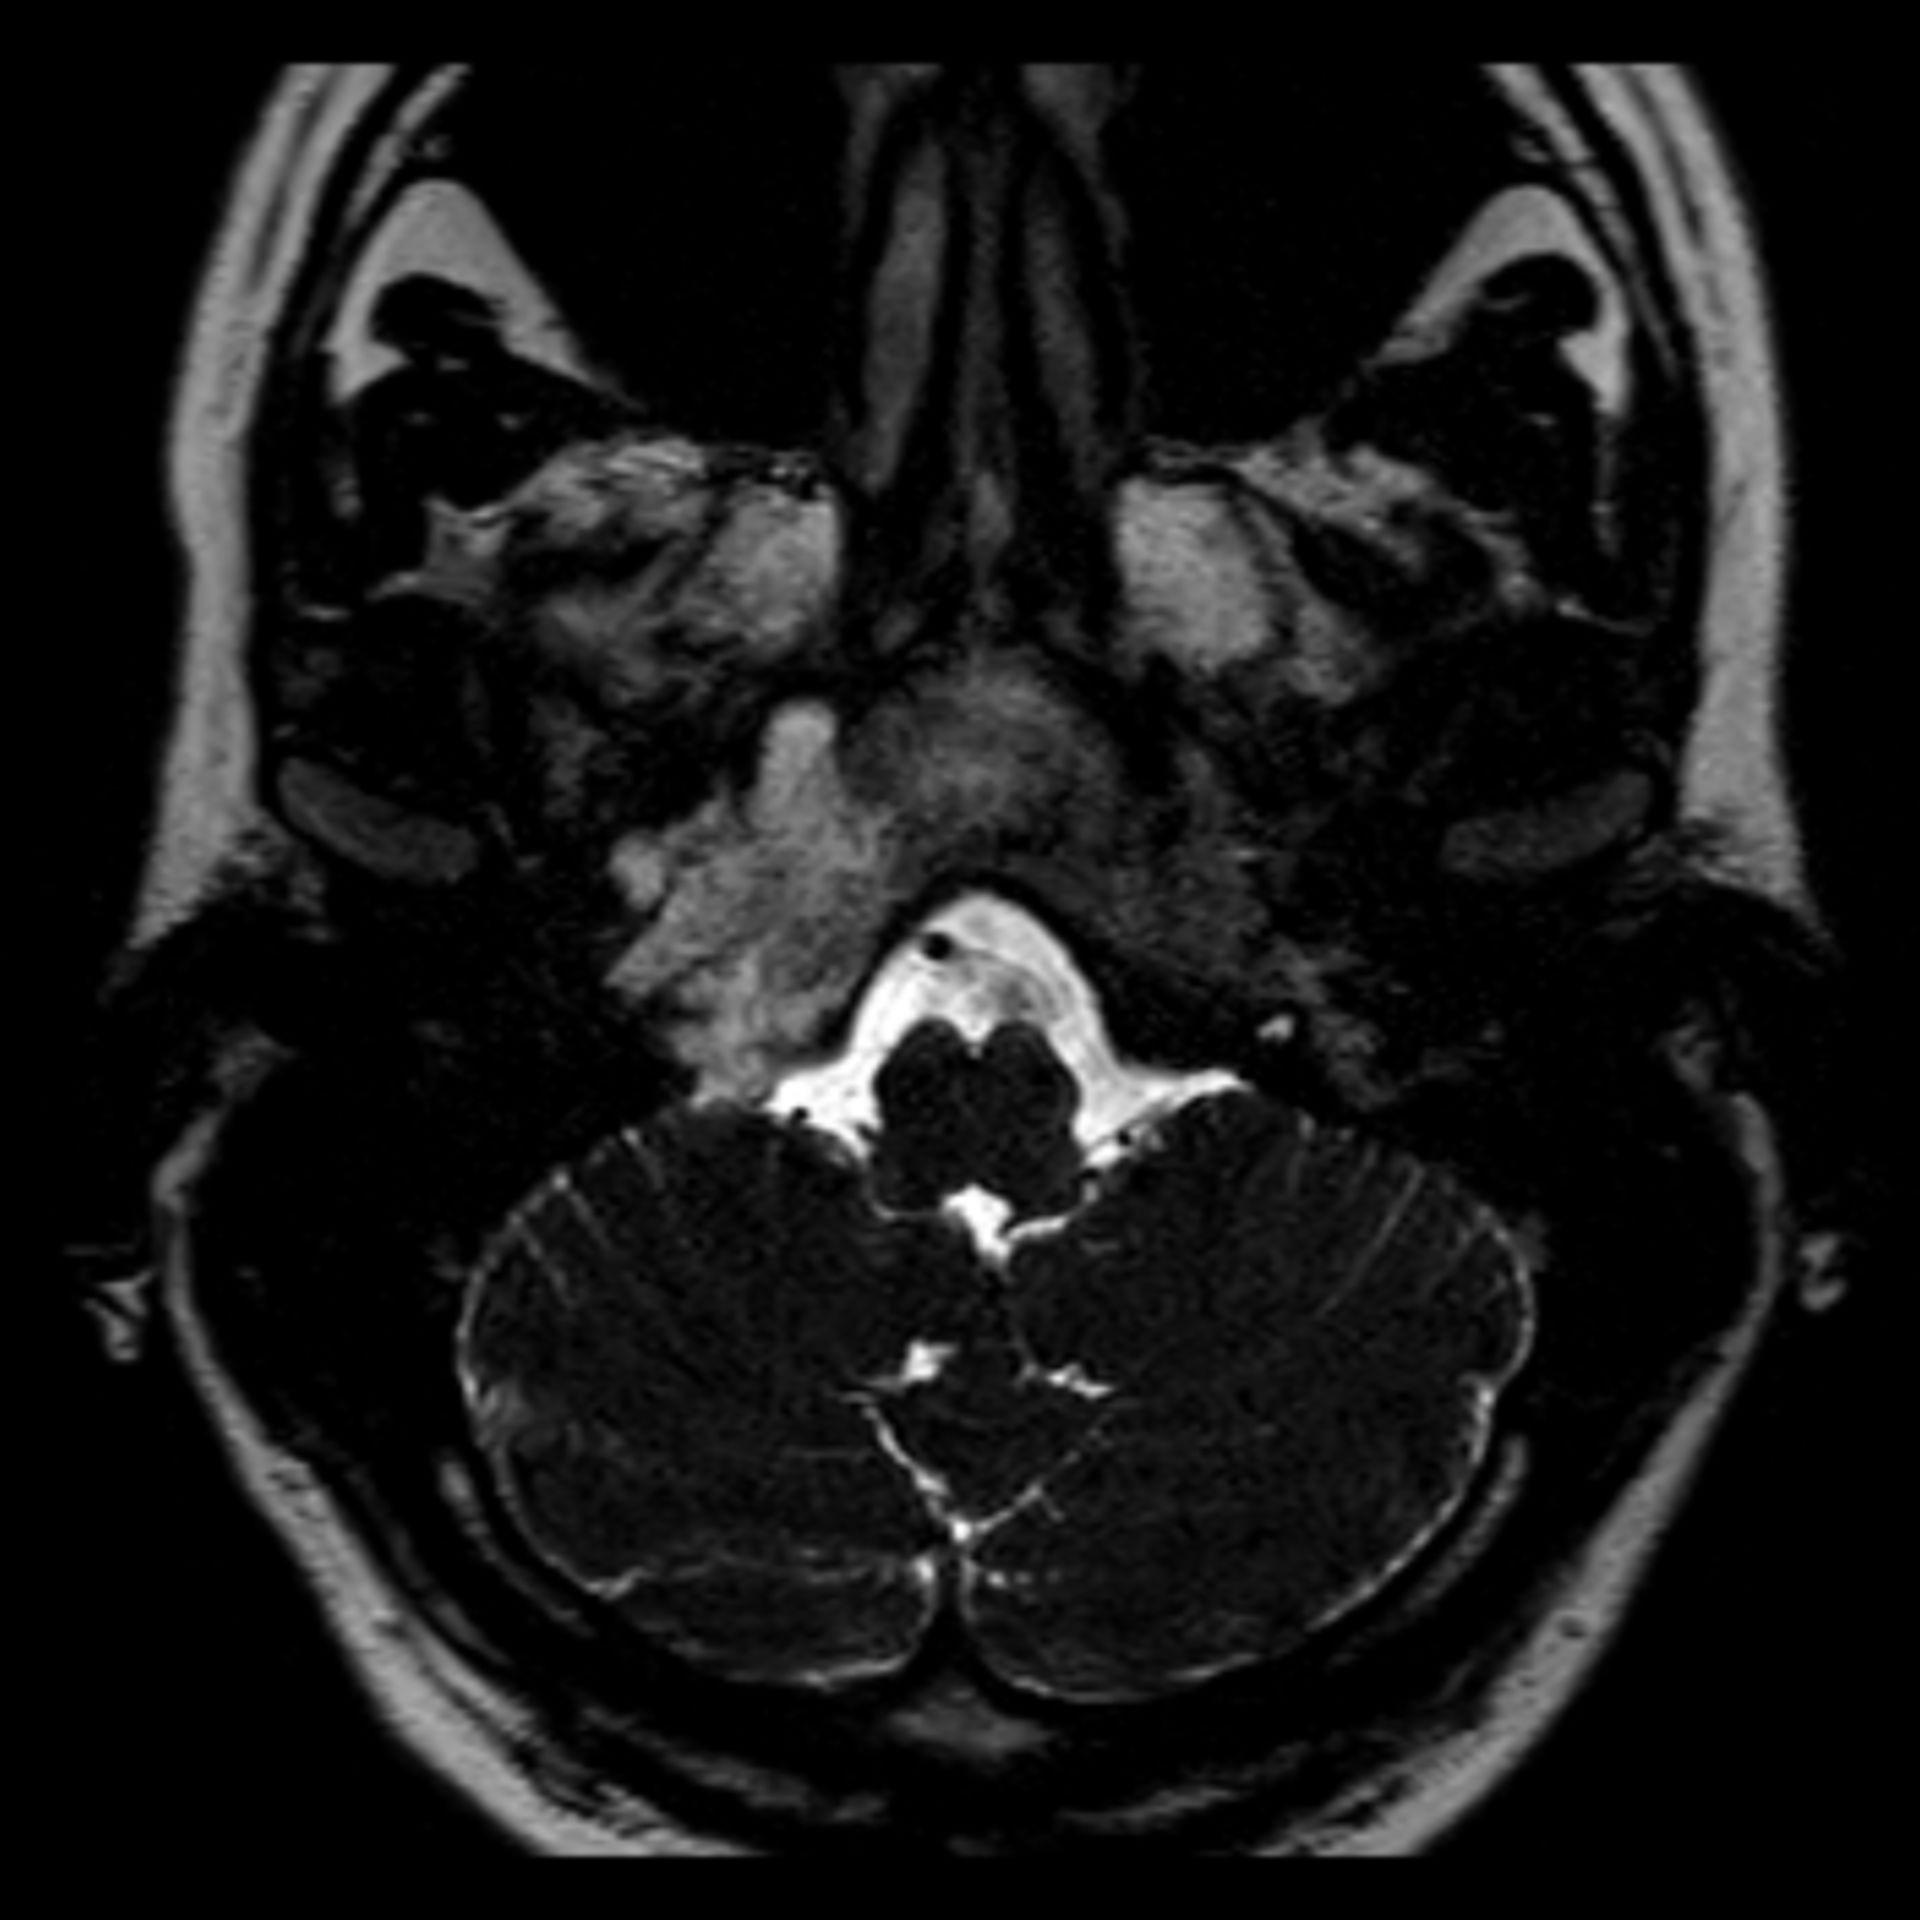 t2_3d_drive_tra100001: MRT des Kopfes in transversaler Ebene